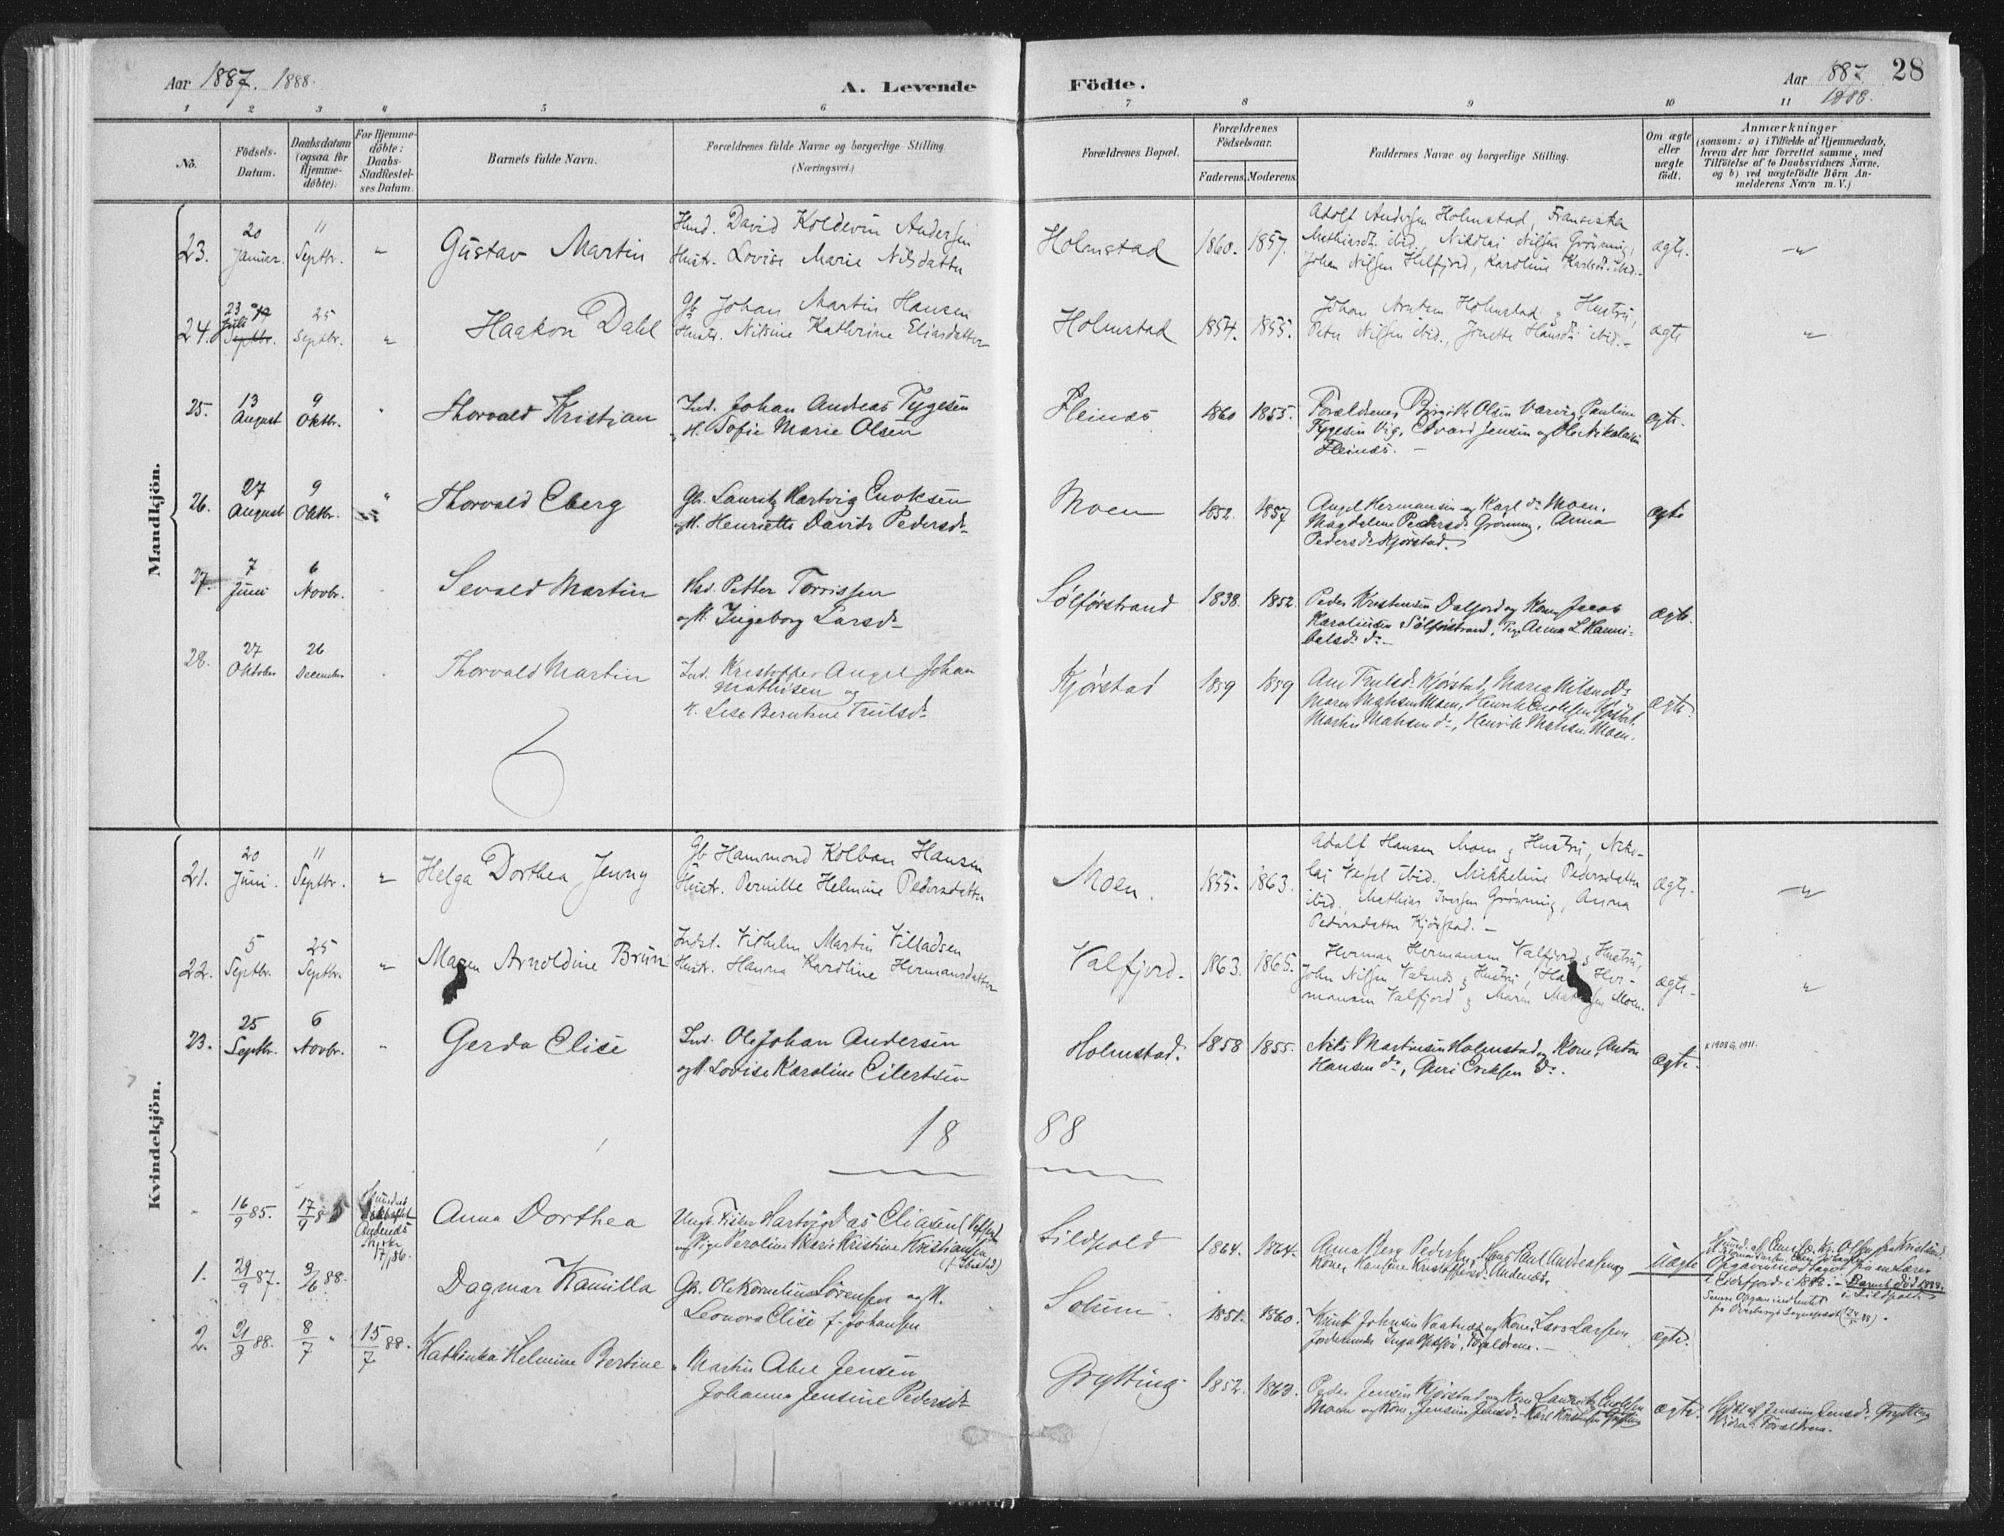 SAT, Ministerialprotokoller, klokkerbøker og fødselsregistre - Nordland, 890/L1286: Ministerialbok nr. 890A01, 1882-1902, s. 28